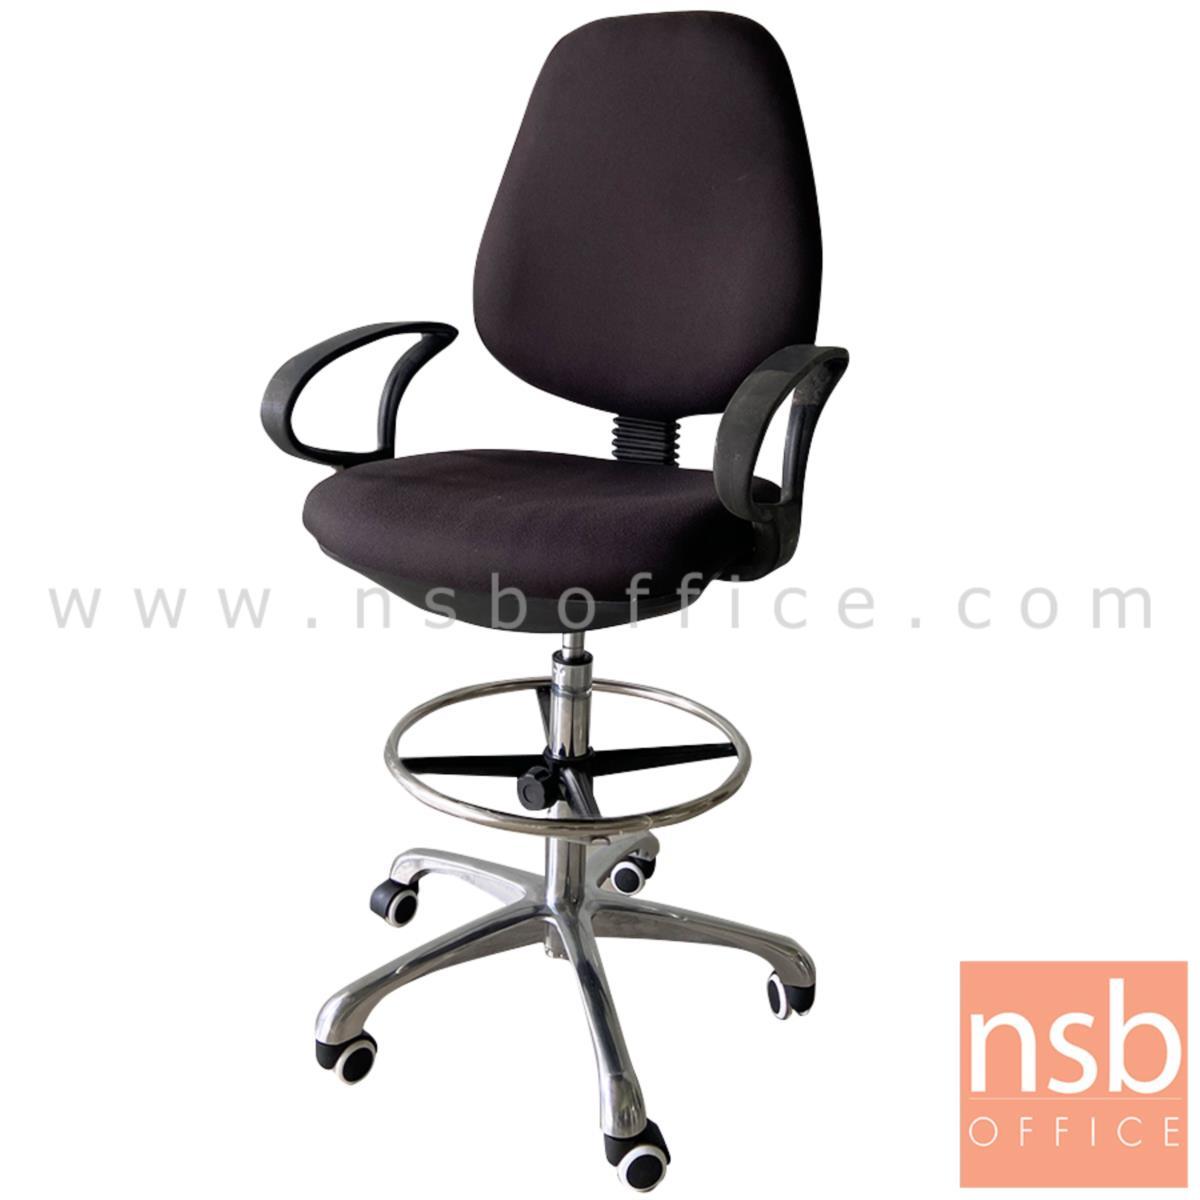 B02A095:เก้าอี้บาร์ รุ่น Bexhill (เบกซ์ฮิลล์) ขนาด 46W cm. โช๊คแก๊ส มีวงเหยียบ